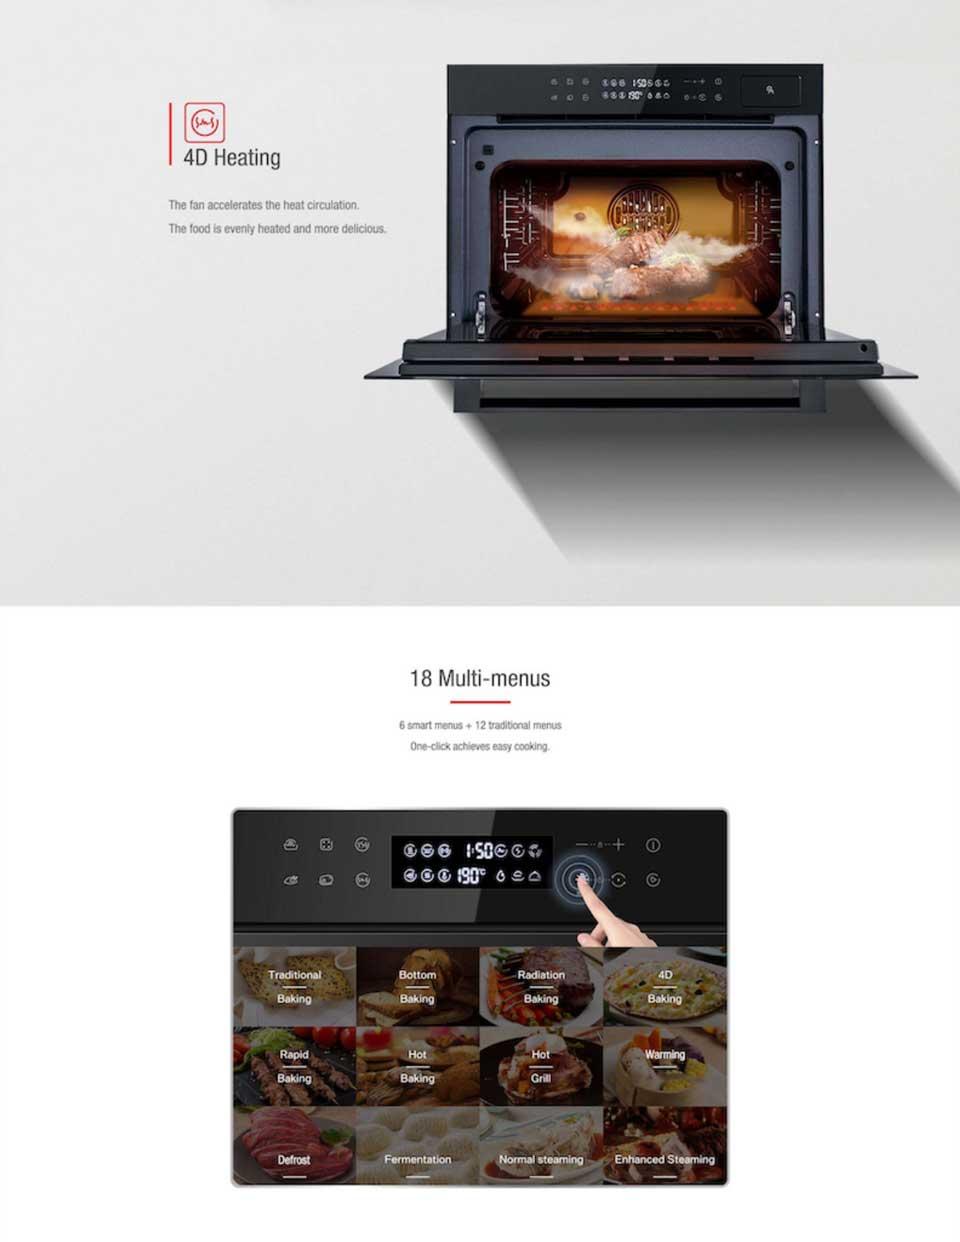 DE&E ZK4585 Multifunctional Steam & Grill combi-oven